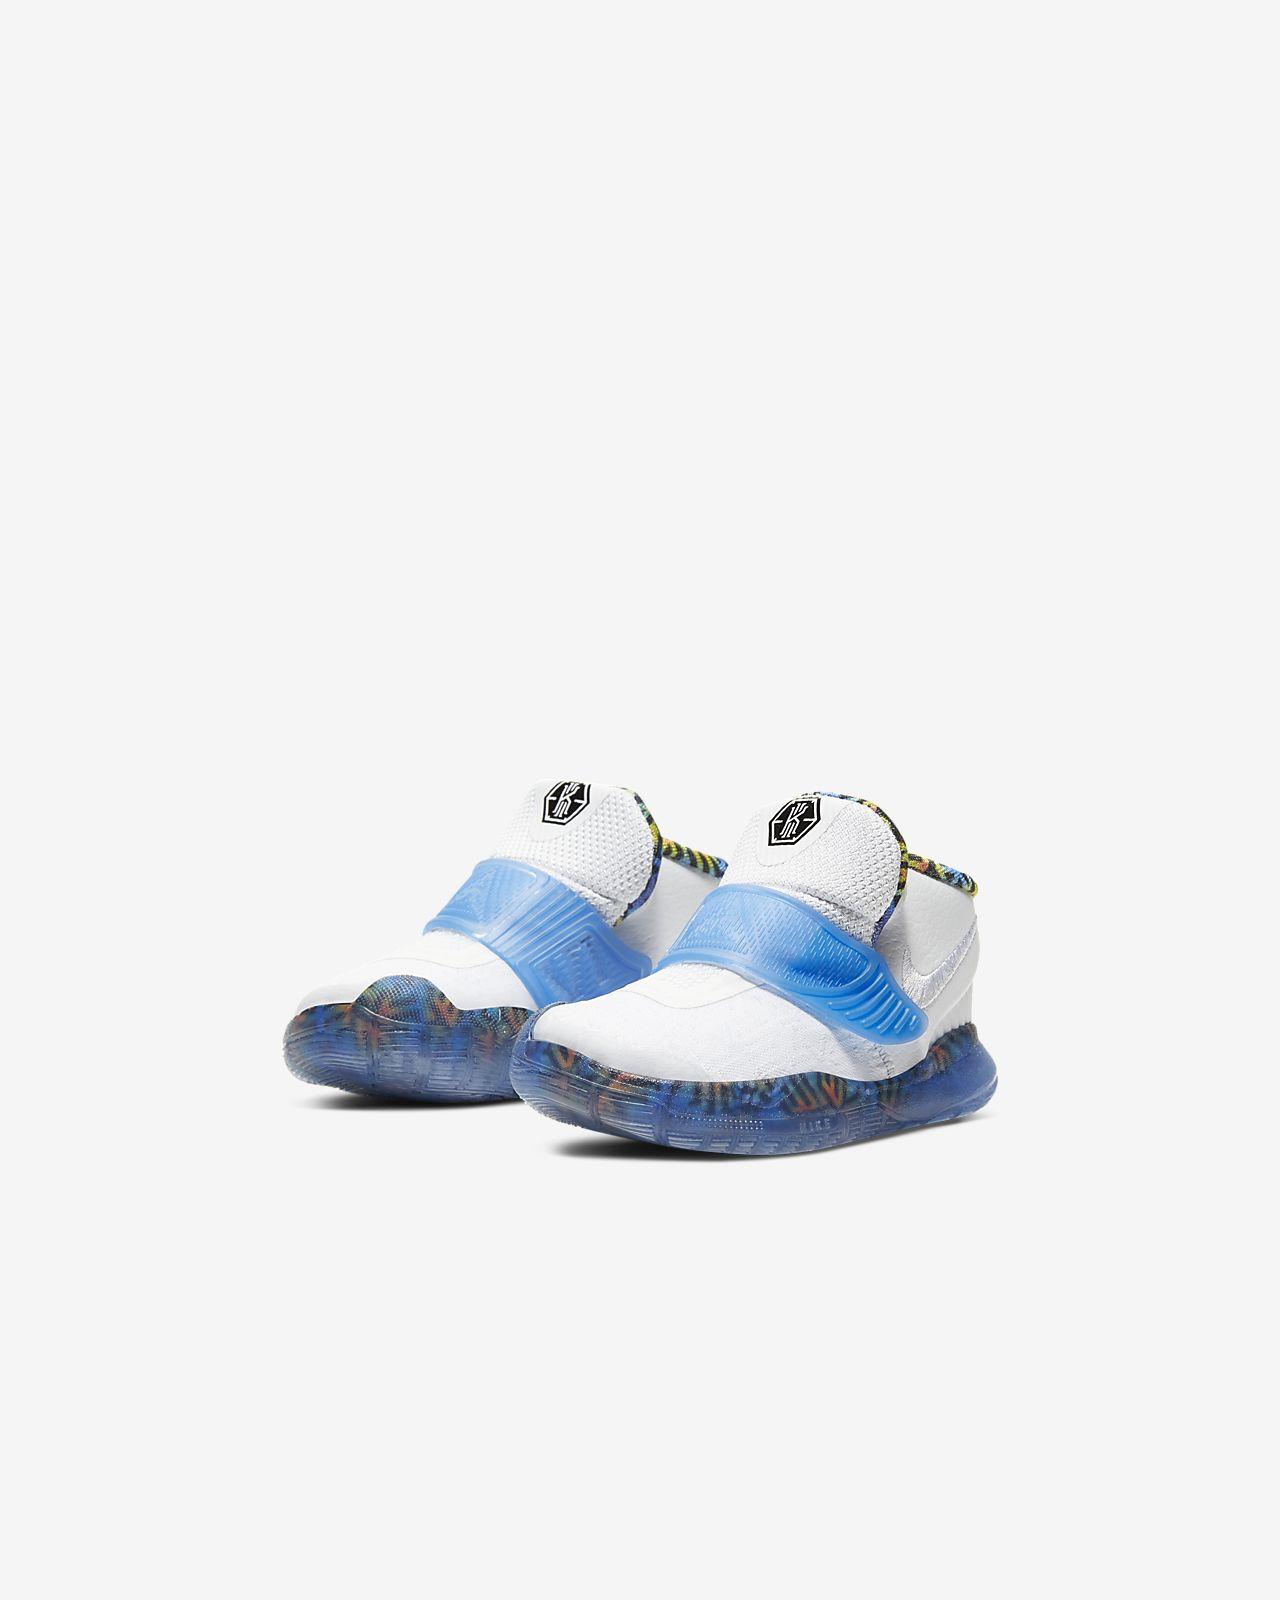 Kyrie 6 BabyToddler Shoe